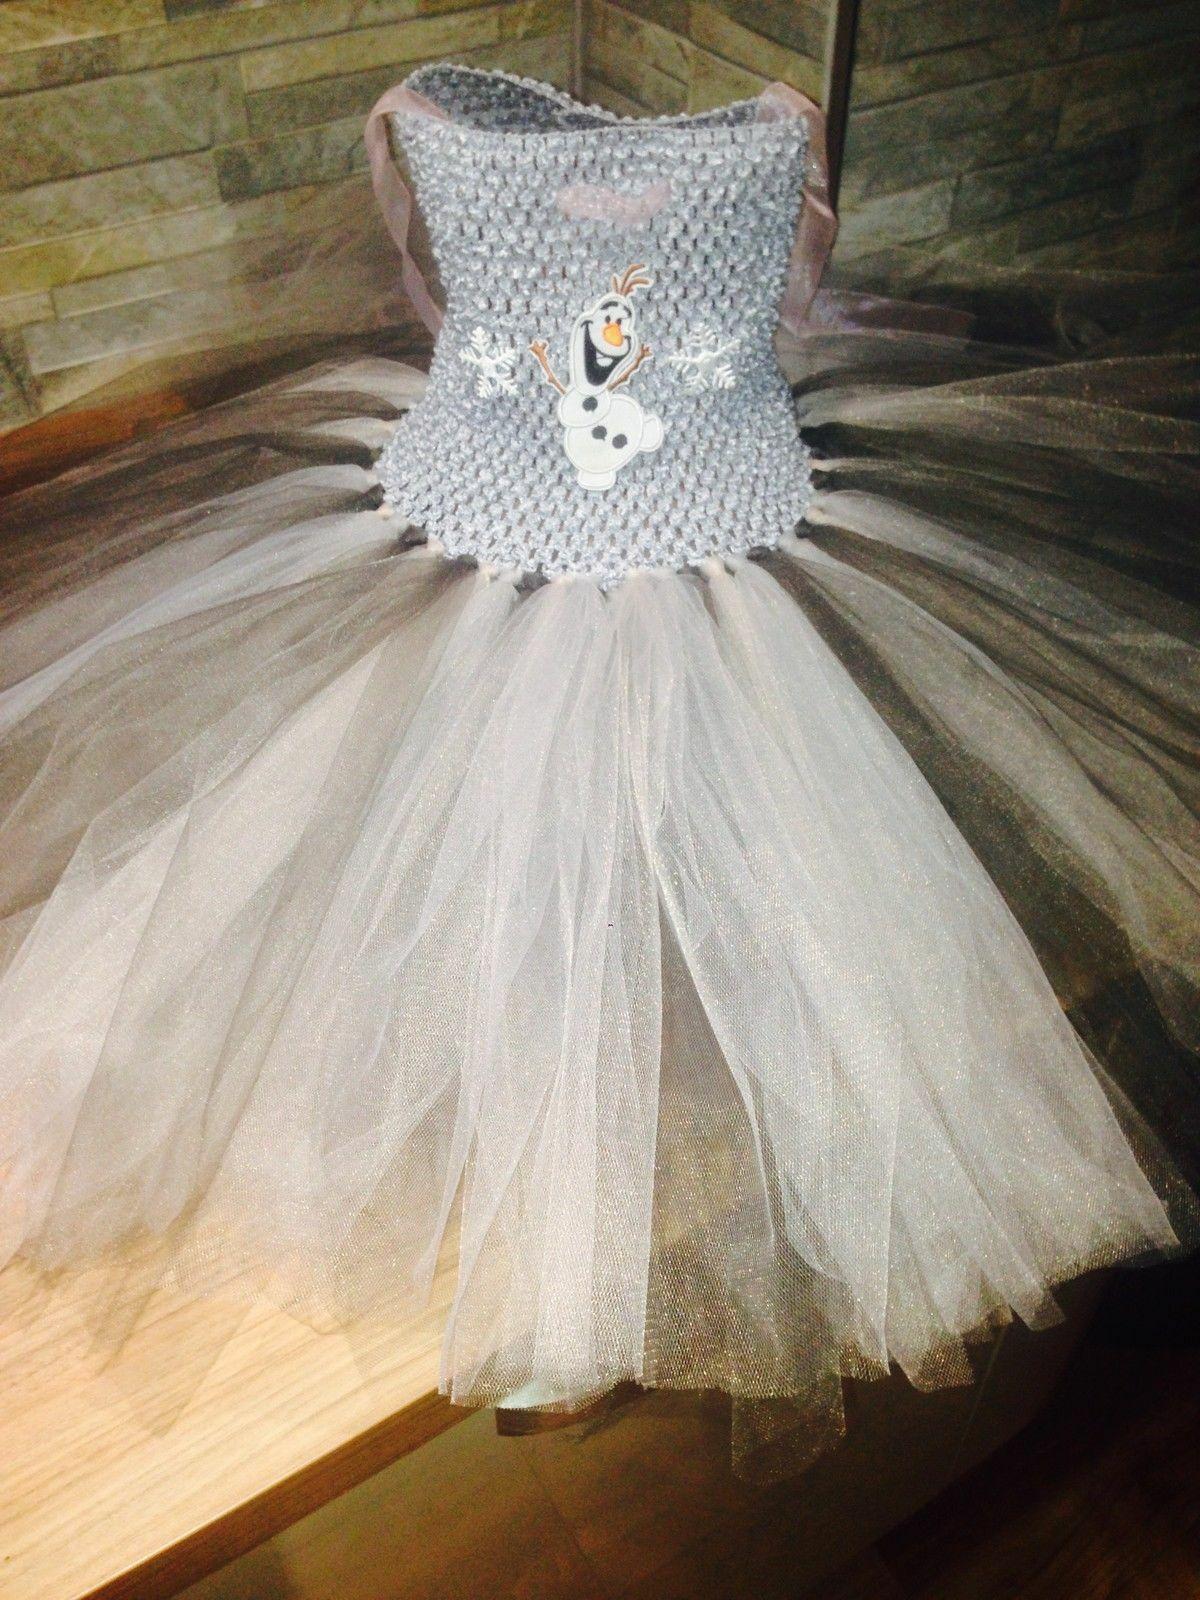 Disney Frozen Olaf Princess Handmade Children's Tutu Dress